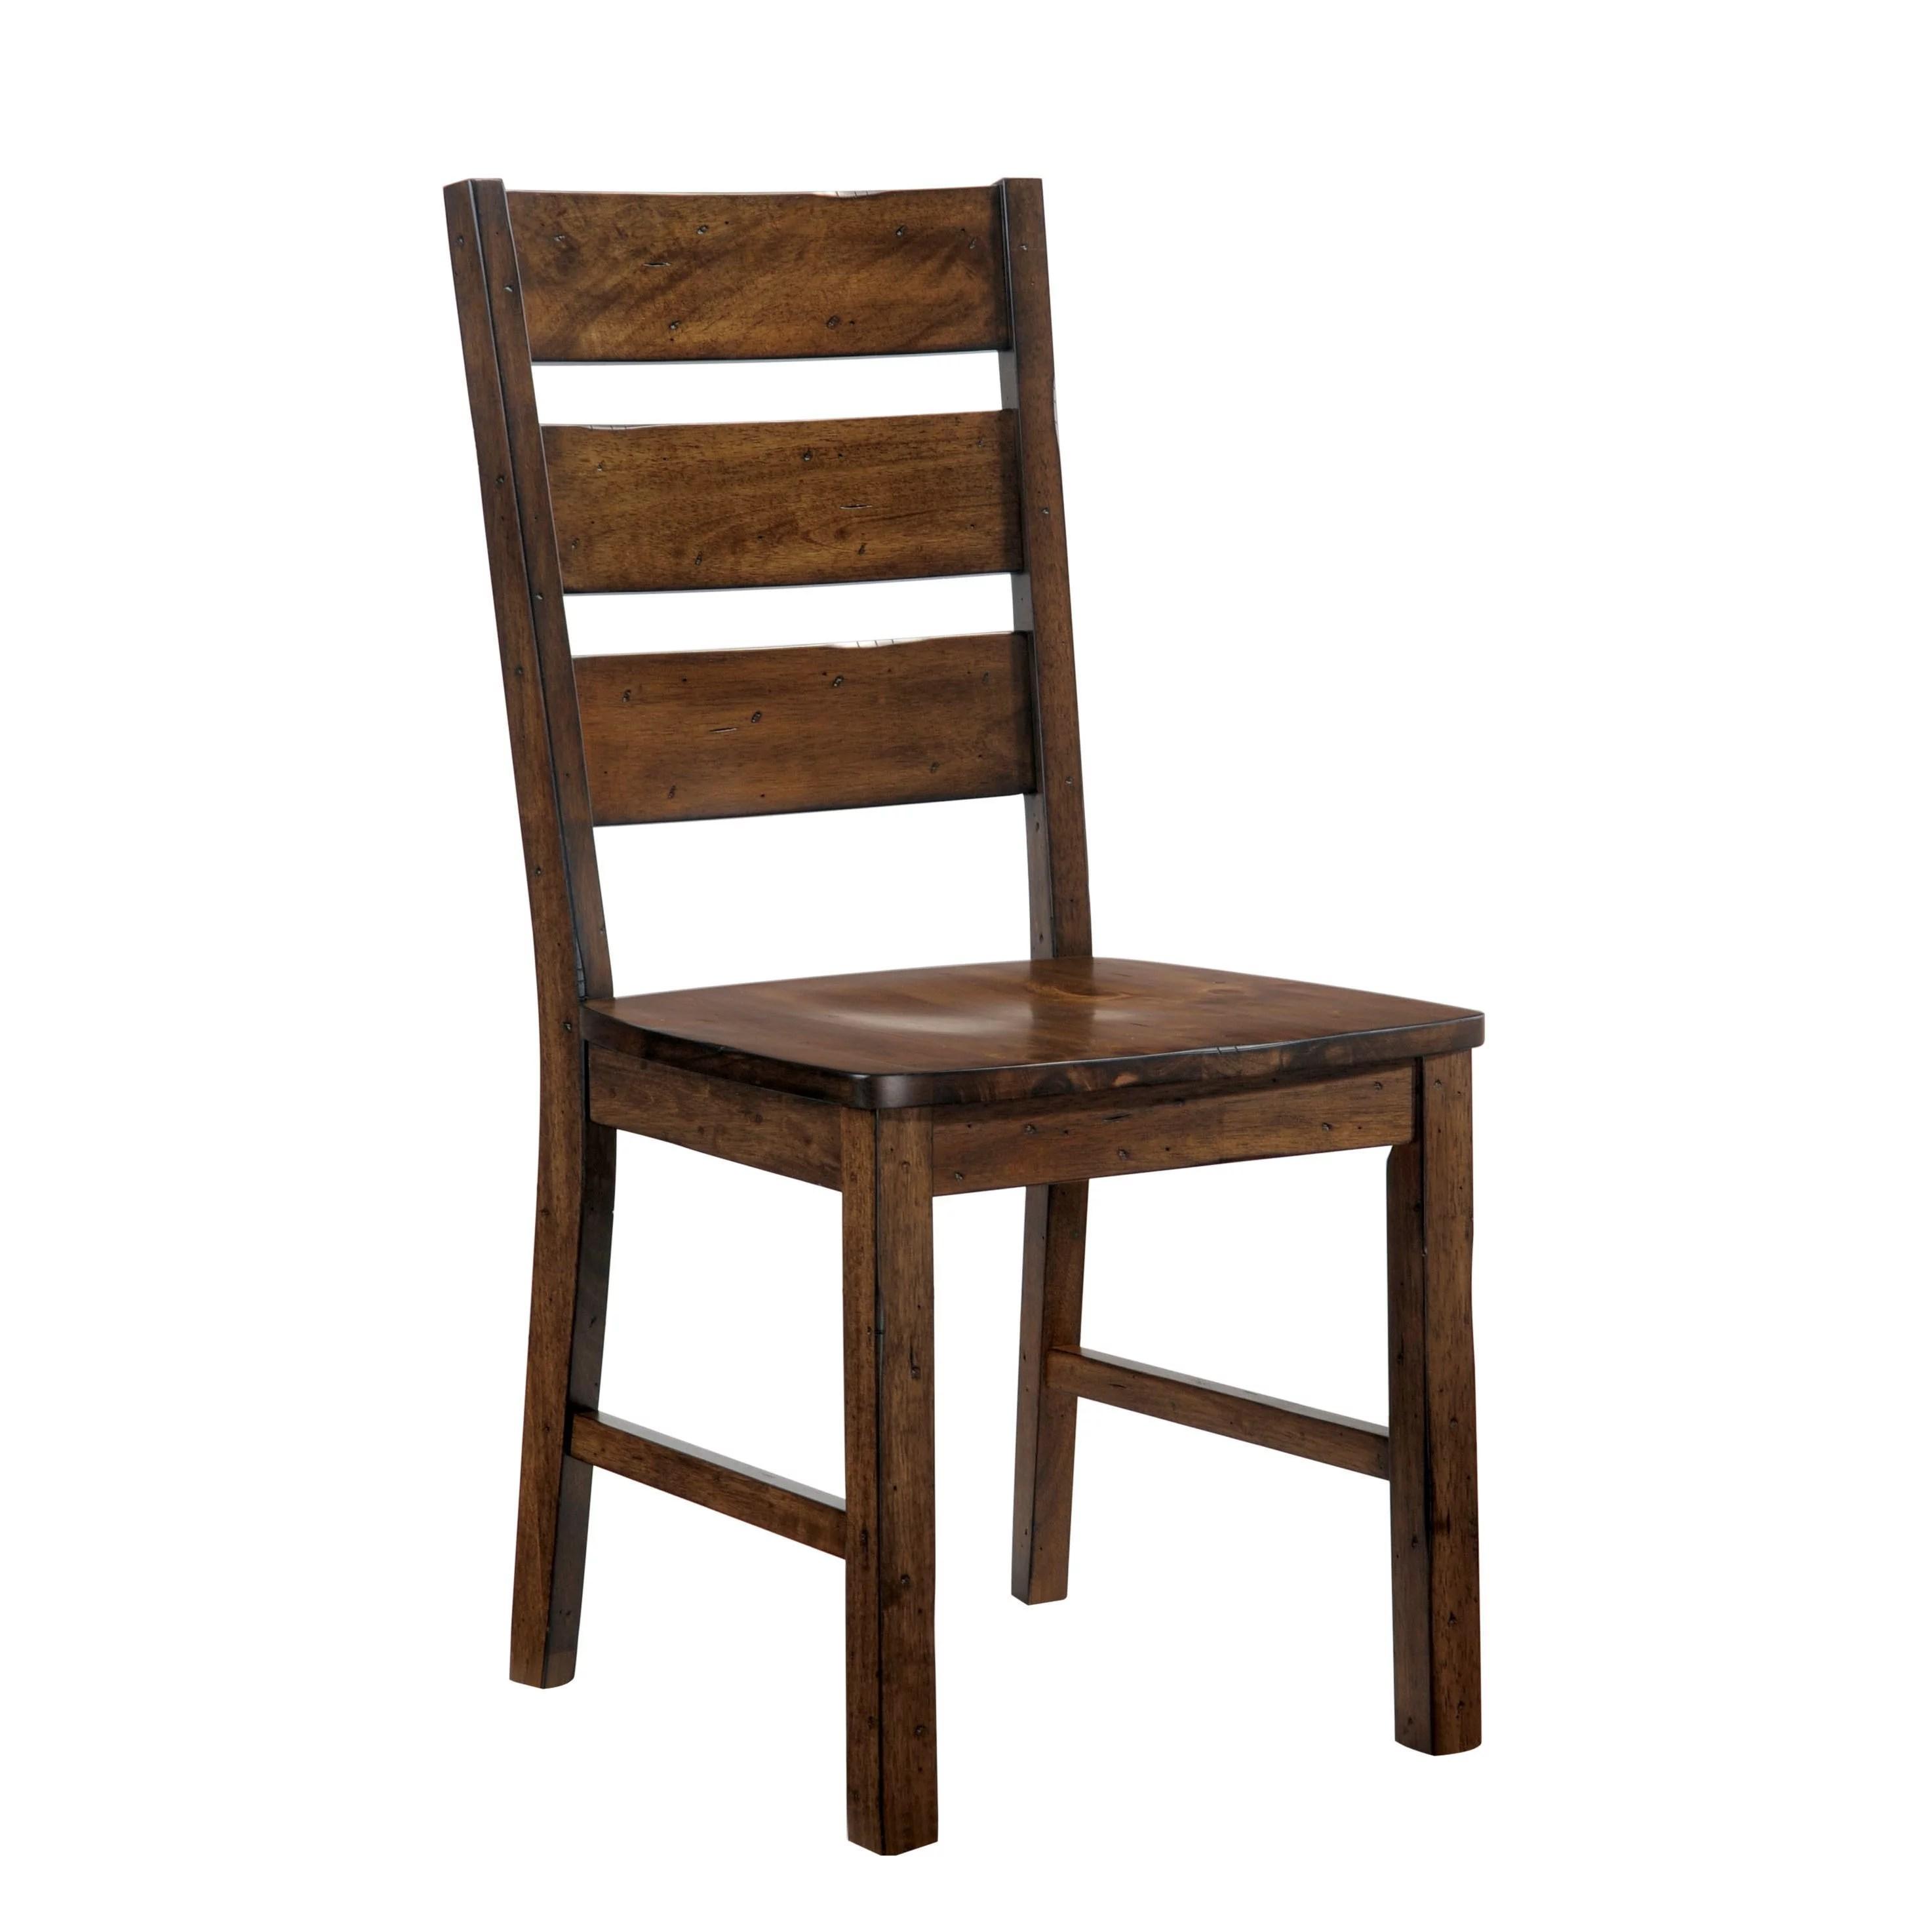 industrial dining chair adult bean bag chairs furniture of america terele walnut finish rustic set 2 walmart com